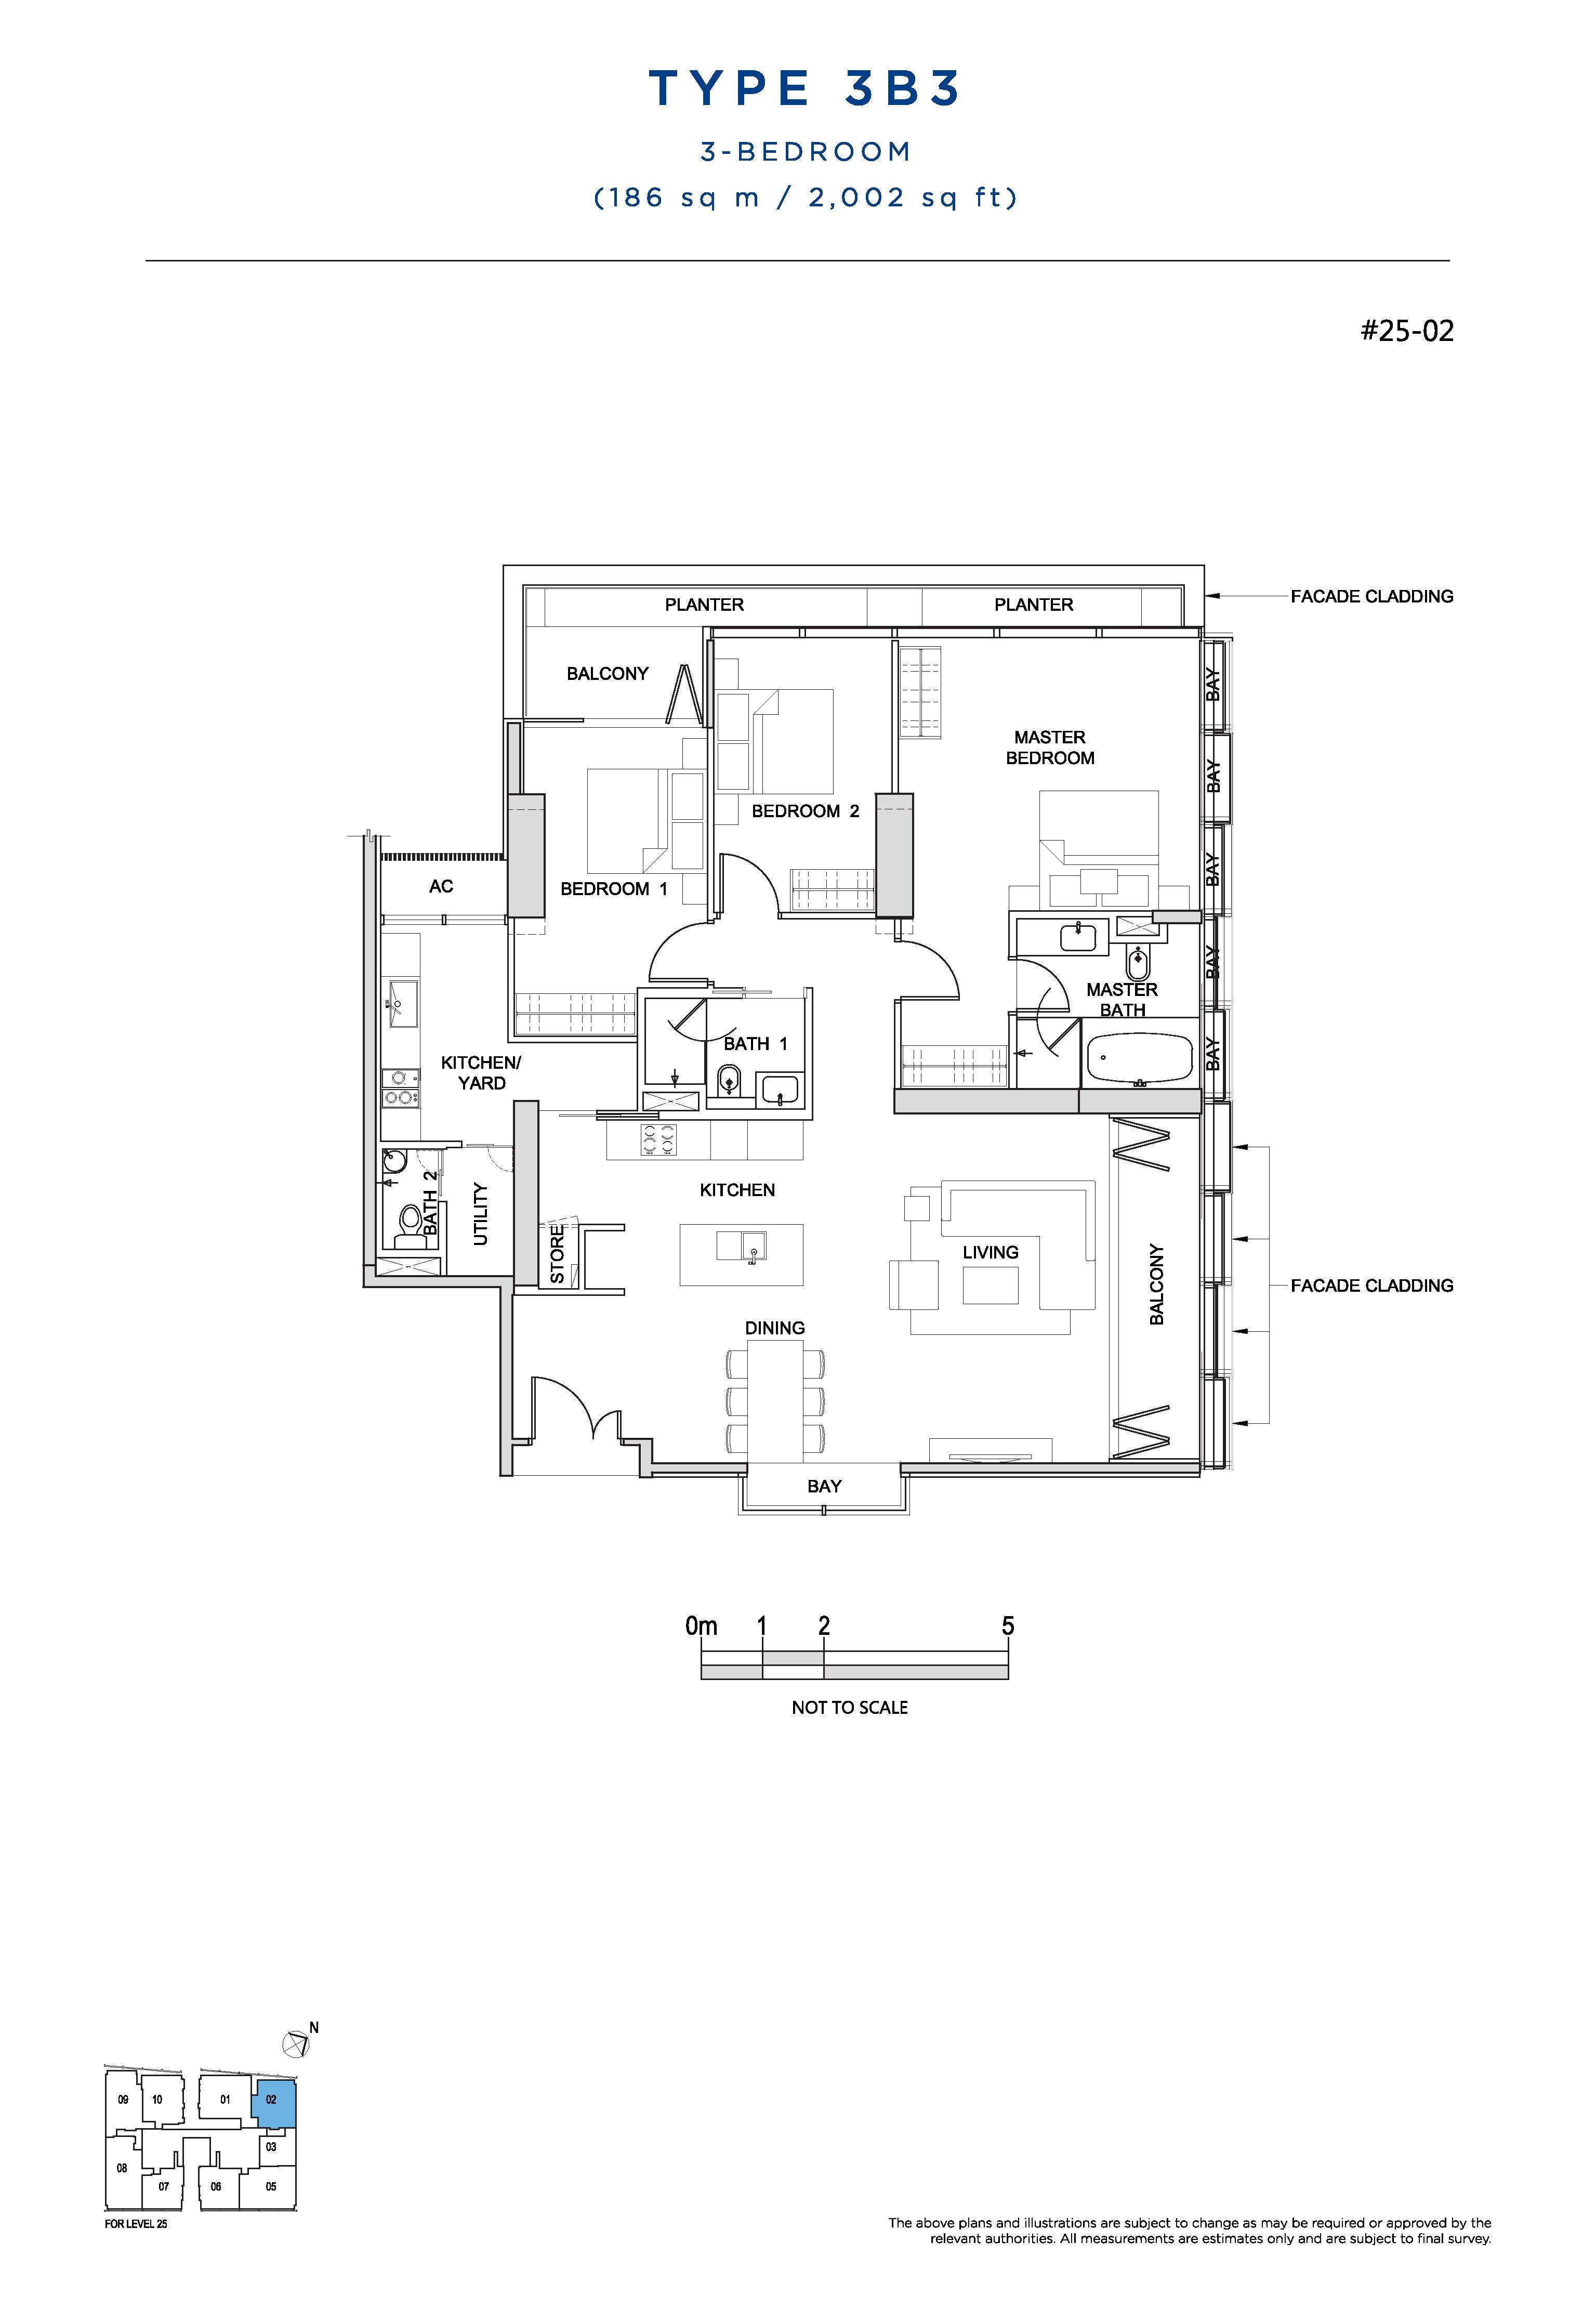 South Beach Residences 3 Bedroom Floor Plans Type 3B3